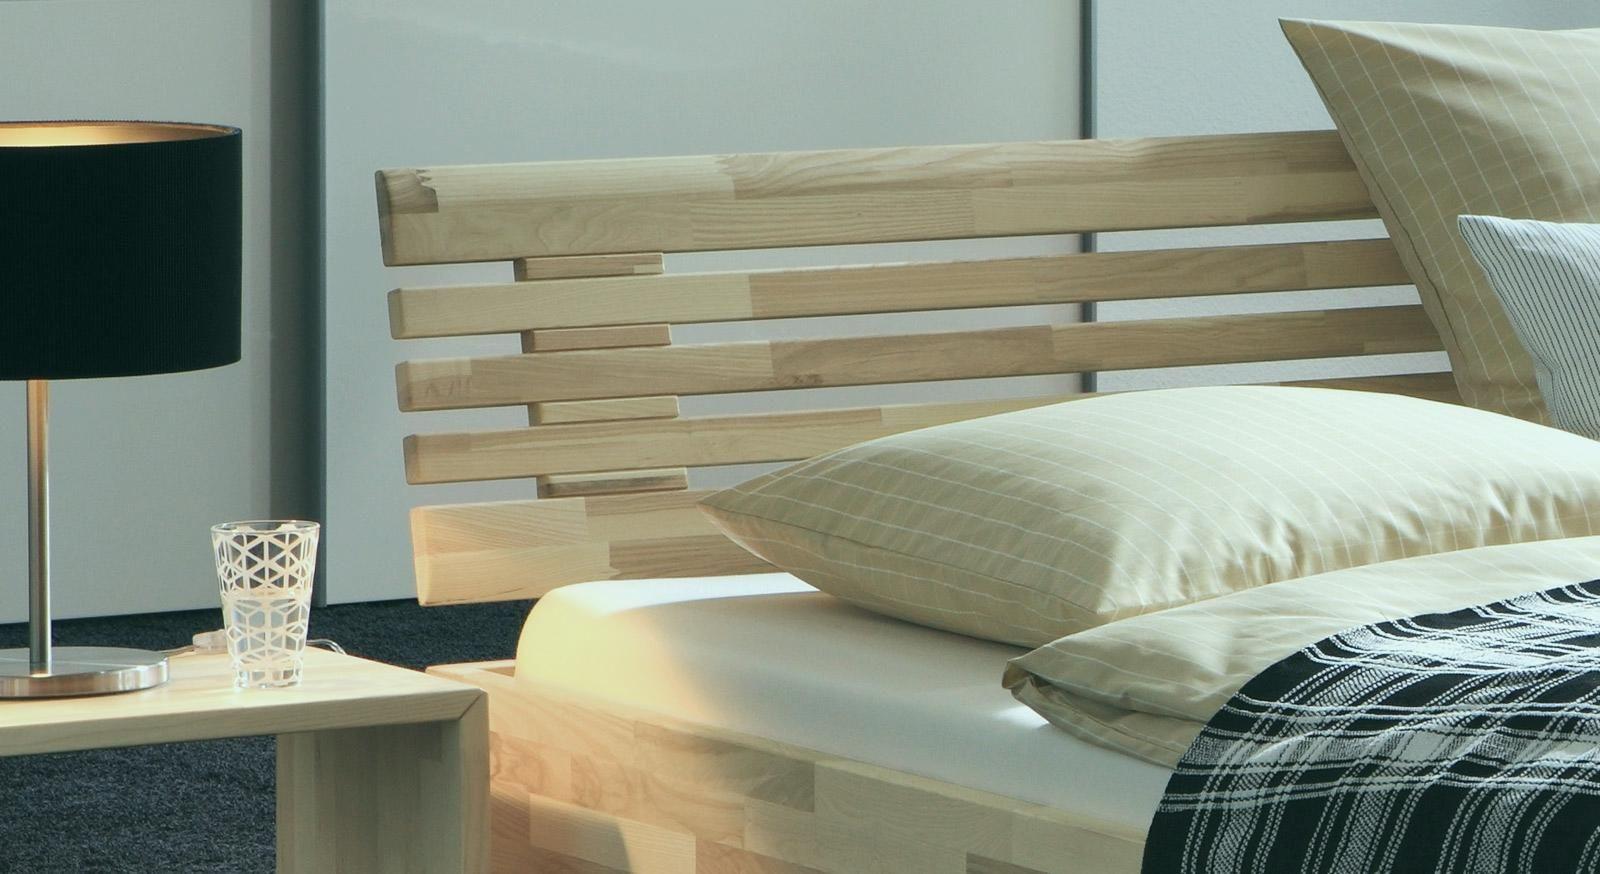 Full Size of Kopfteil Bett Selber Bauen Holz Perfekt Vr Matratze Tatami Feng Shui Im Schrank Balinesische Betten Bodengleiche Dusche Nachträglich Einbauen Boxspring Hohes Bett Kopfteil Bett Selber Bauen